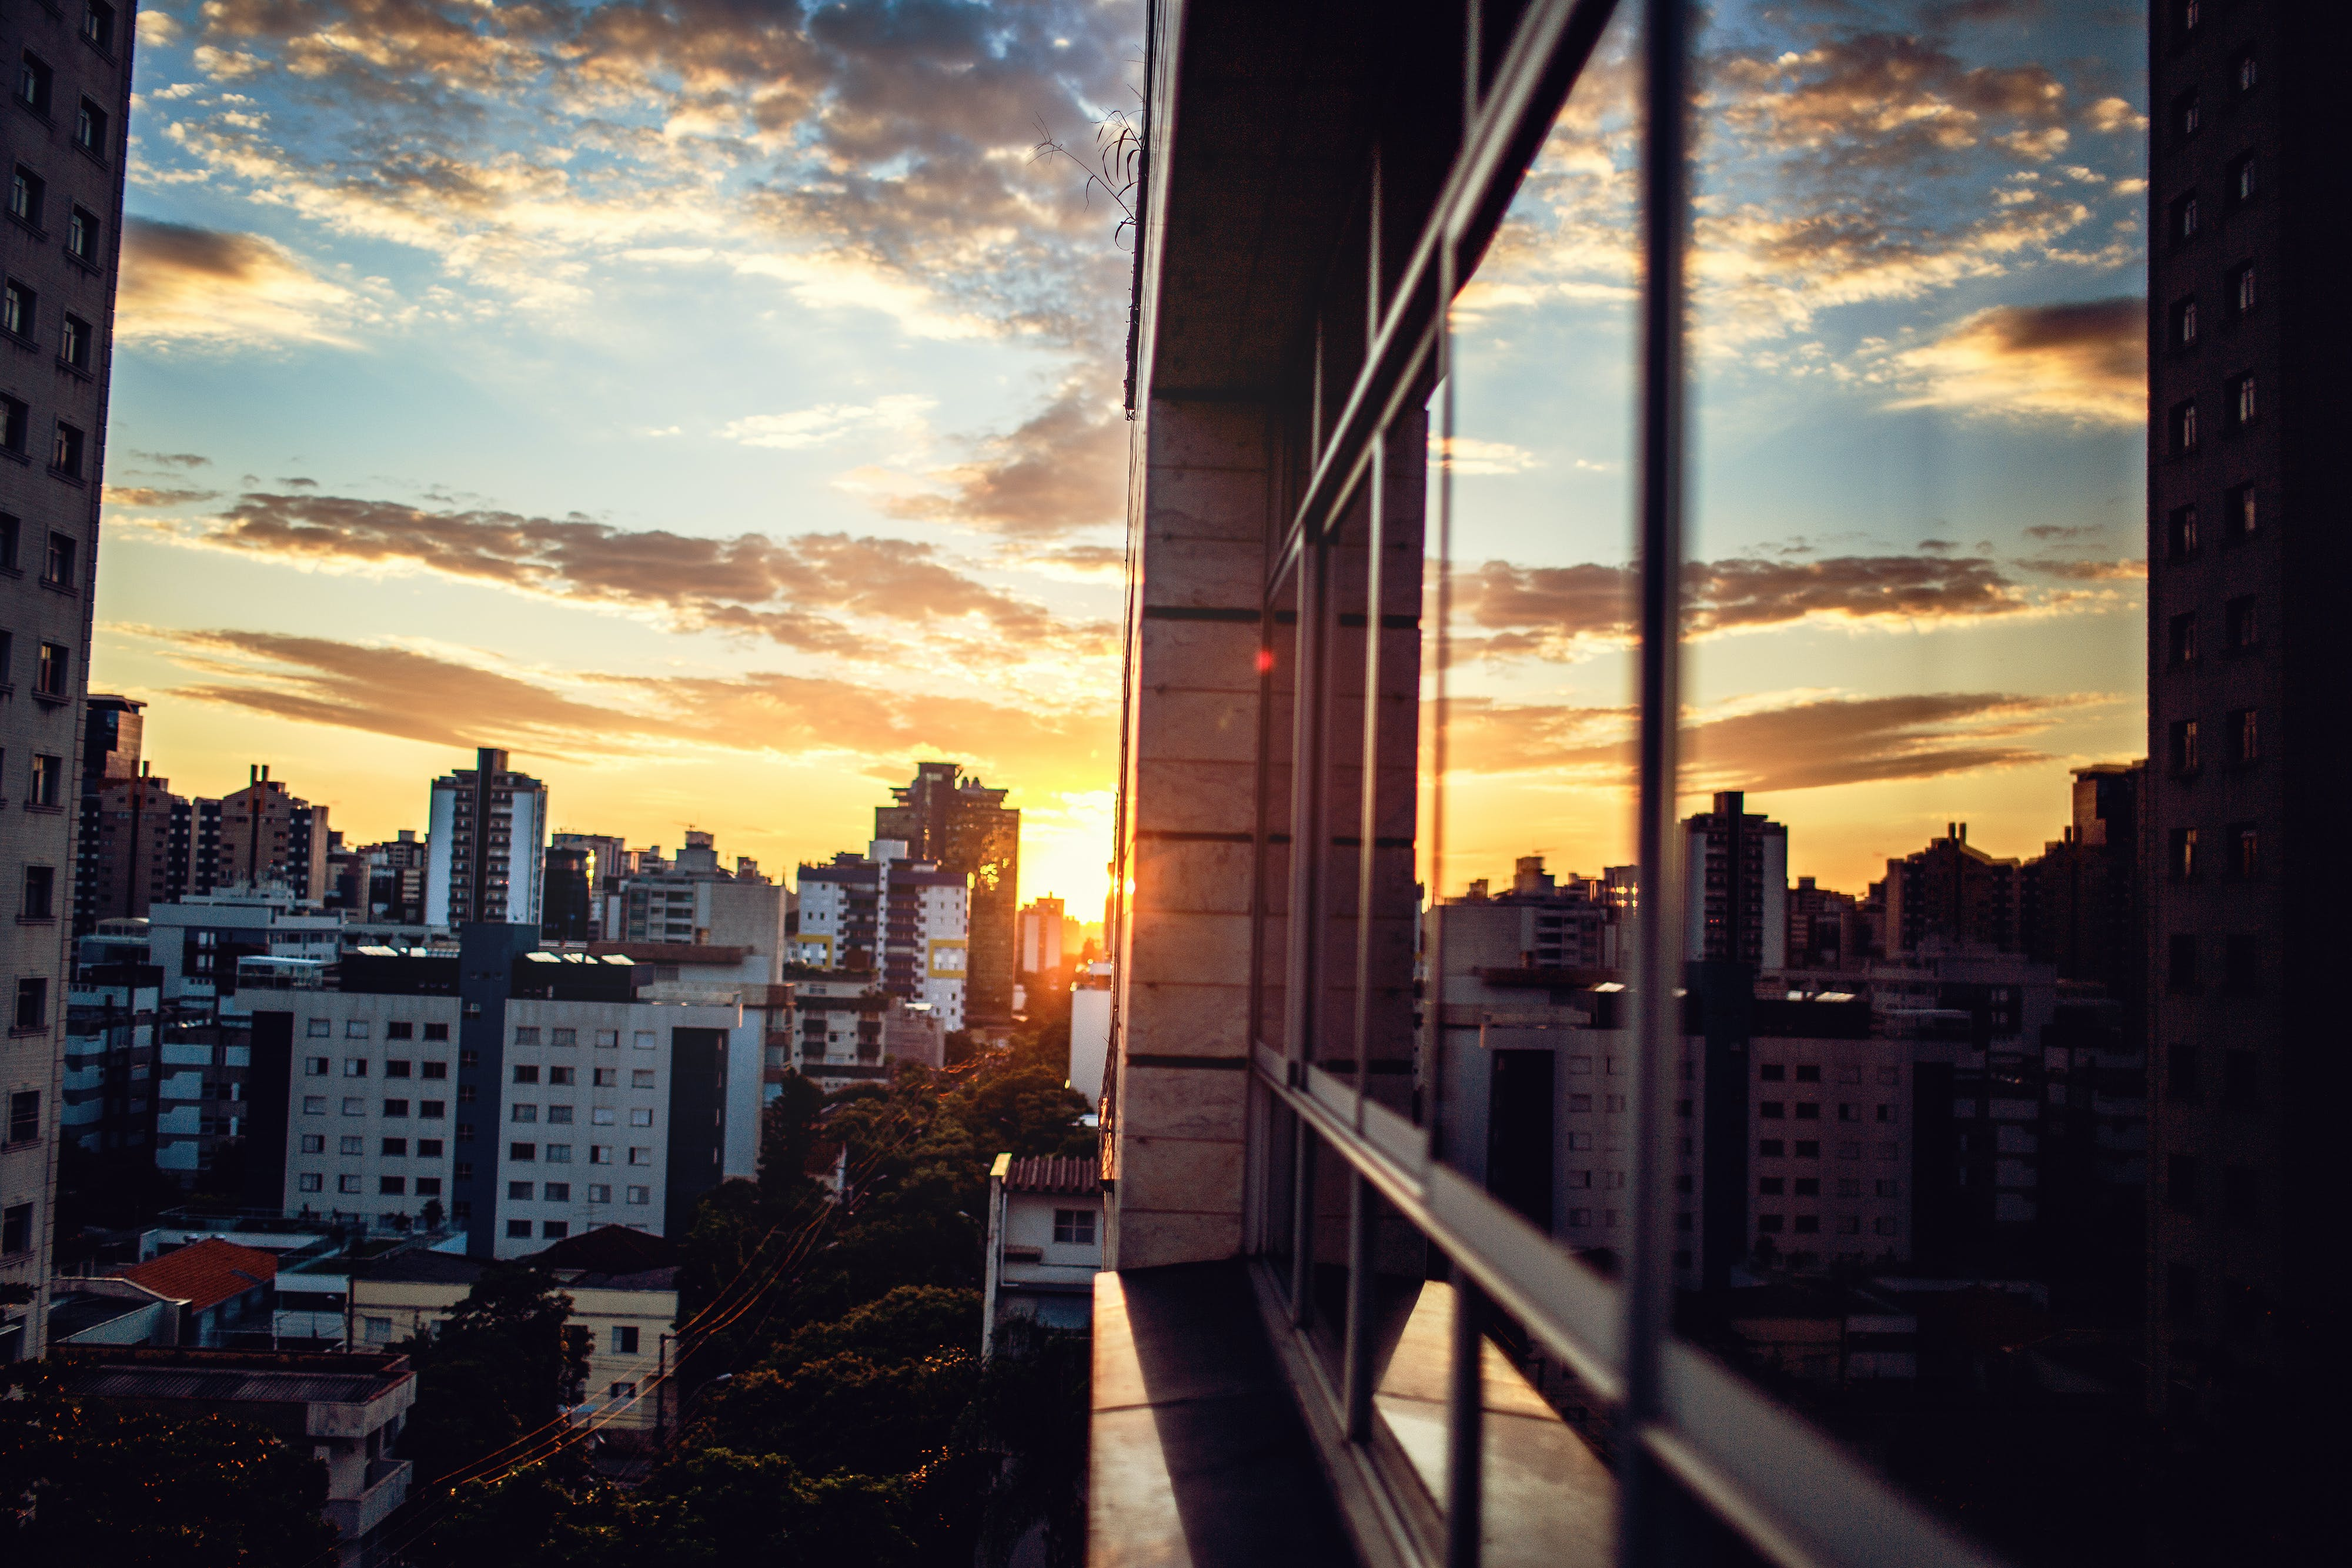 Free stock photo of city, window, urban, horizontal